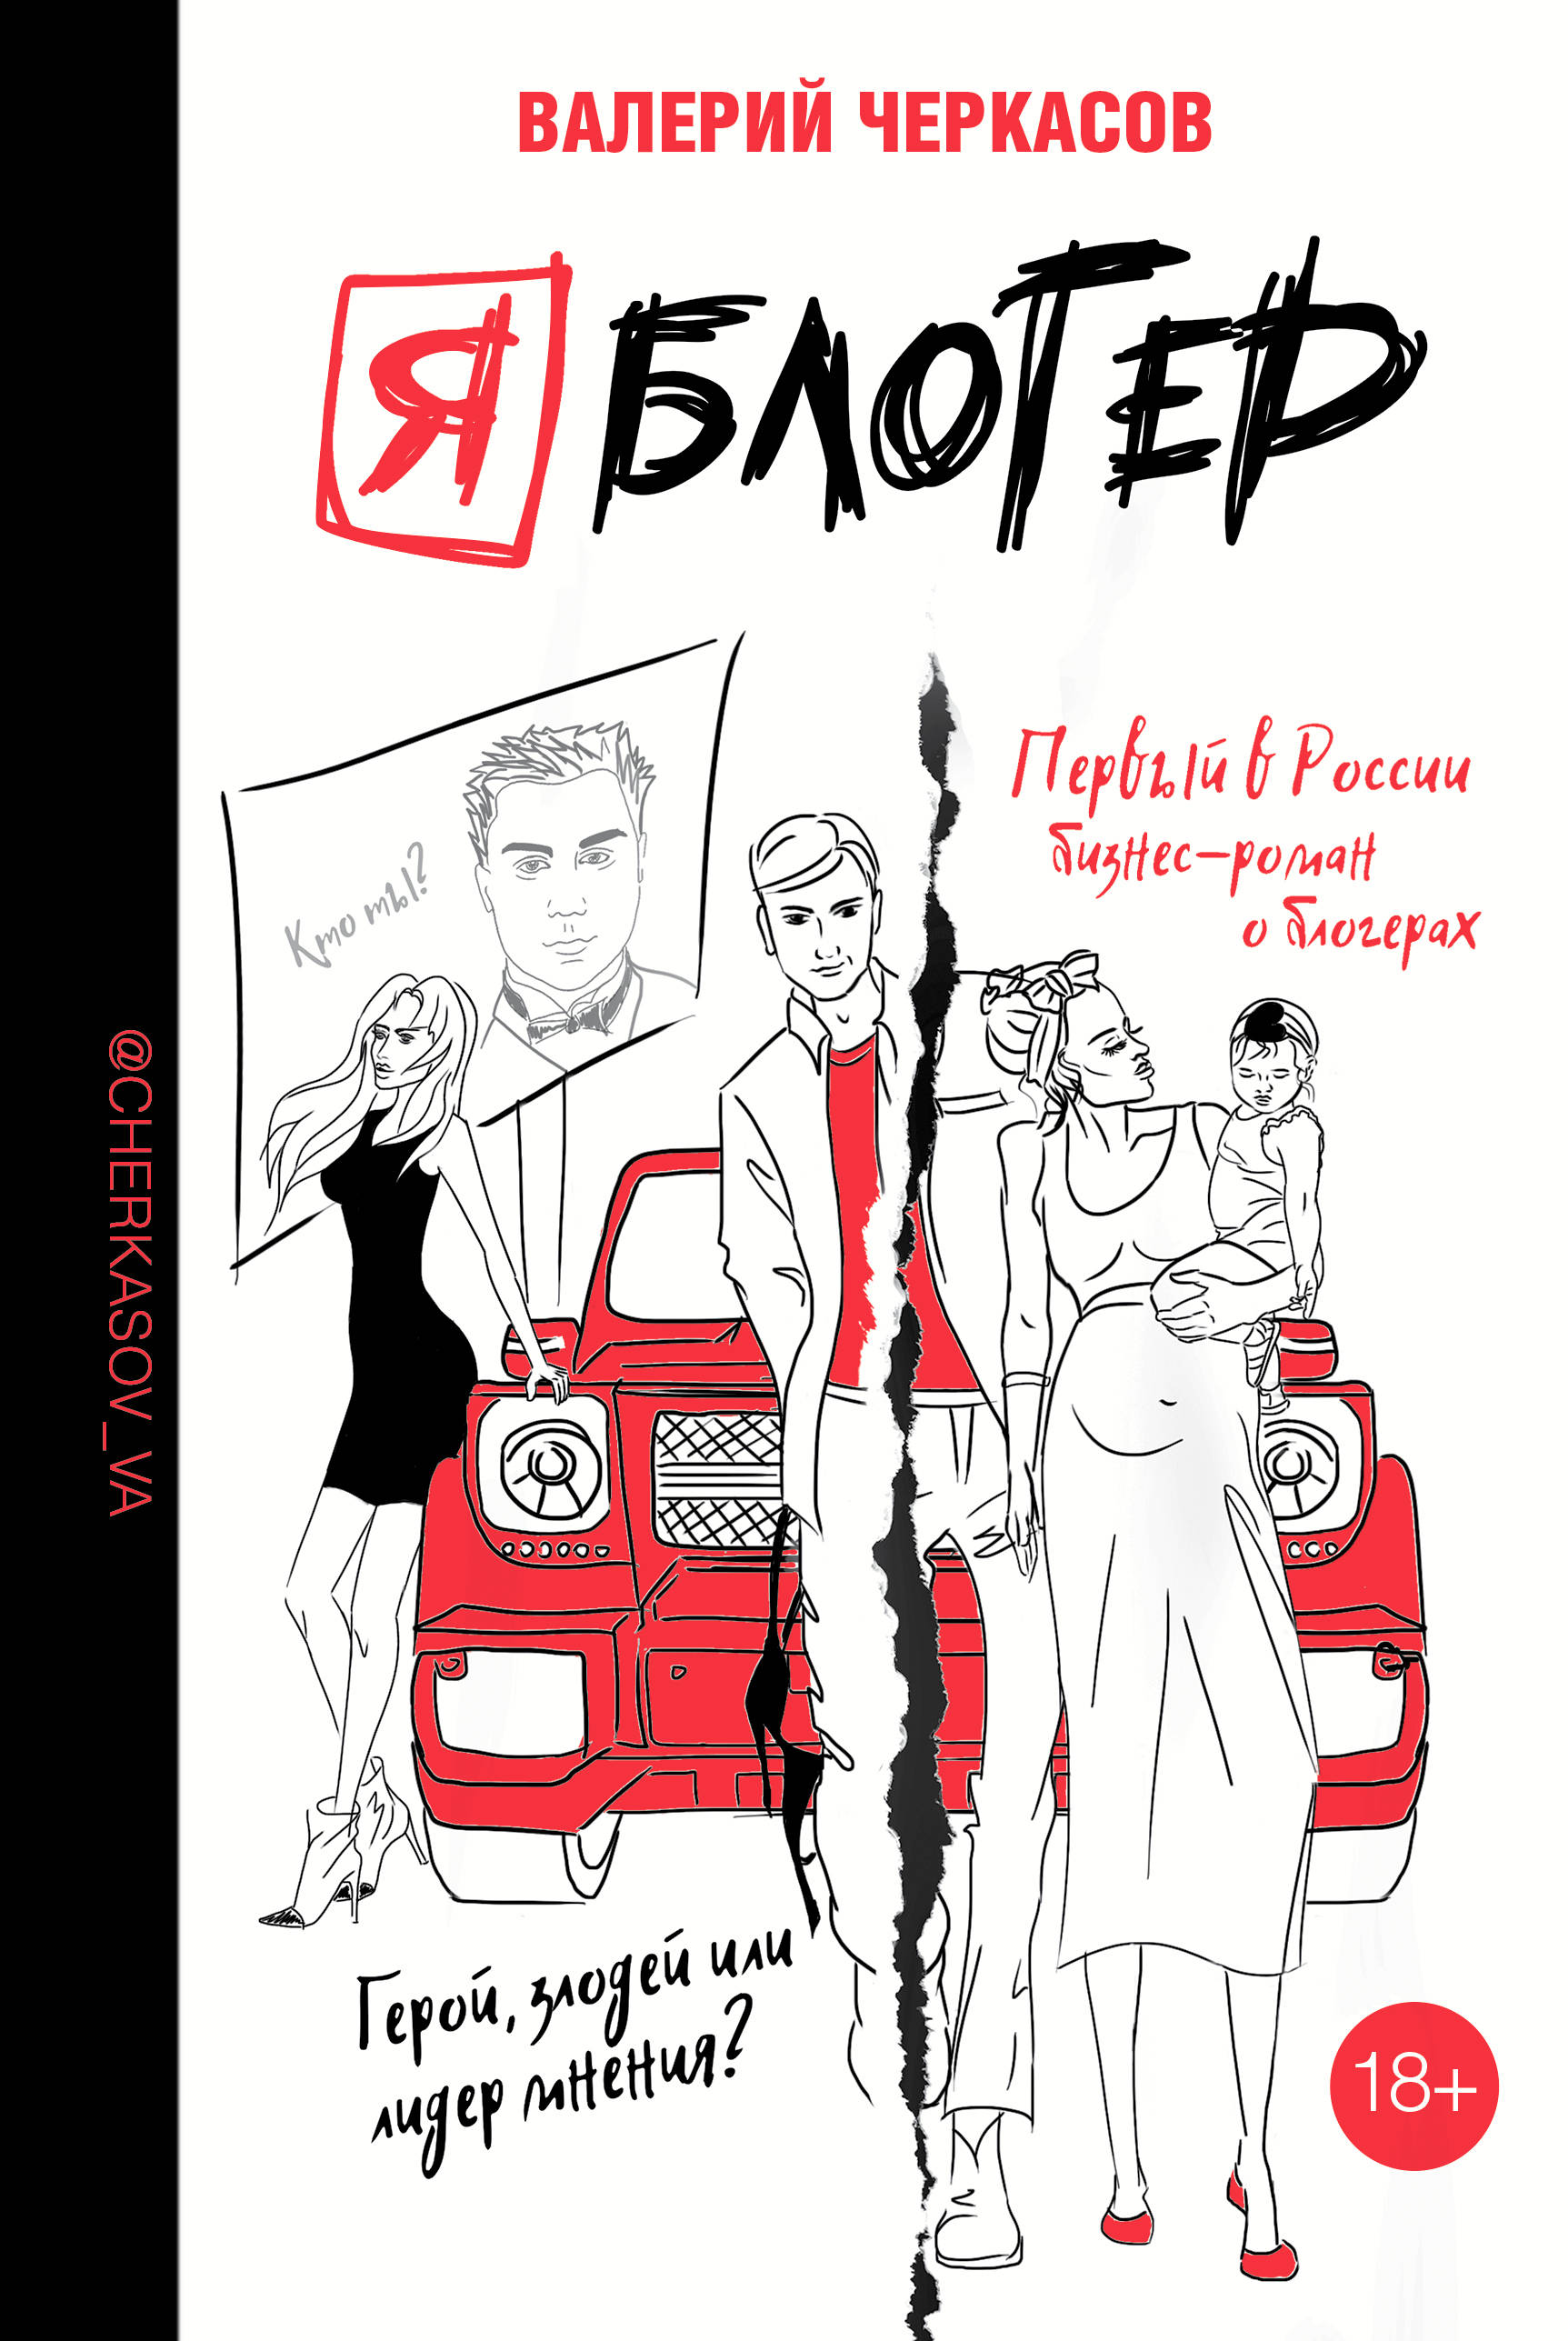 Ja bloger: biznes-roman